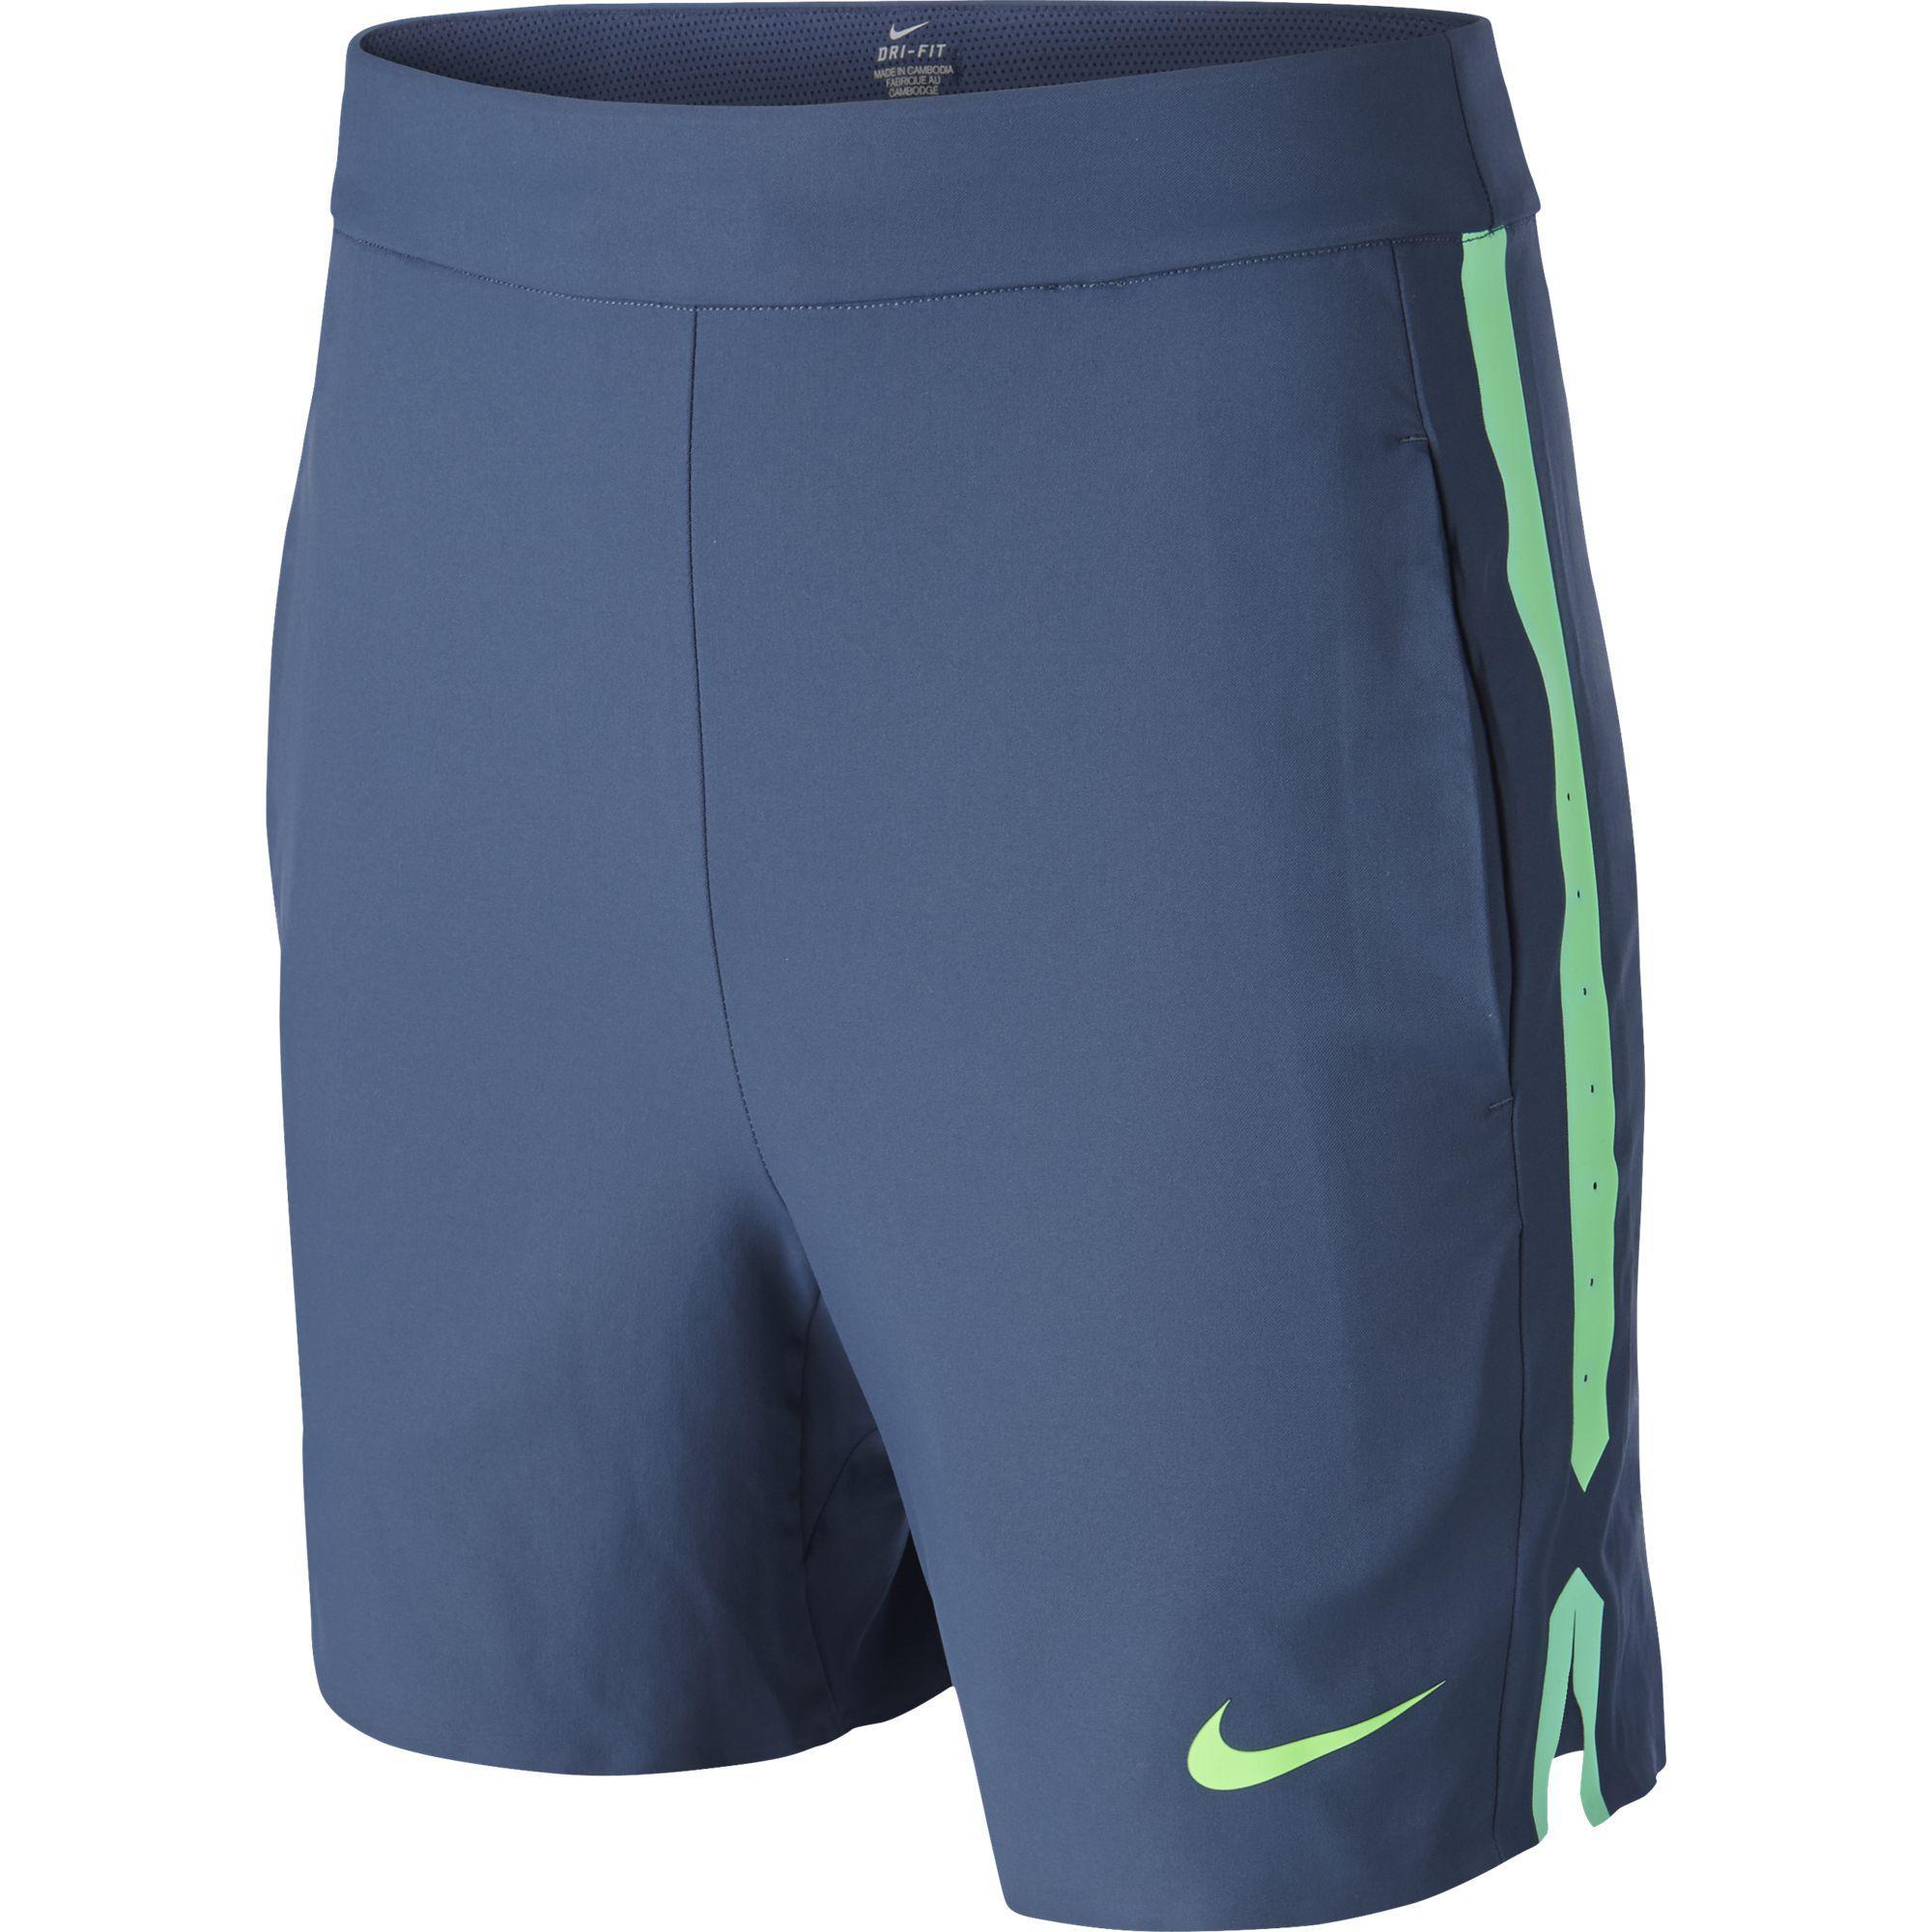 pensión pedazo Rechazo  Nike Boys Gladiator Shorts - Squadron Blue/Green Strike - Tennisnuts.com